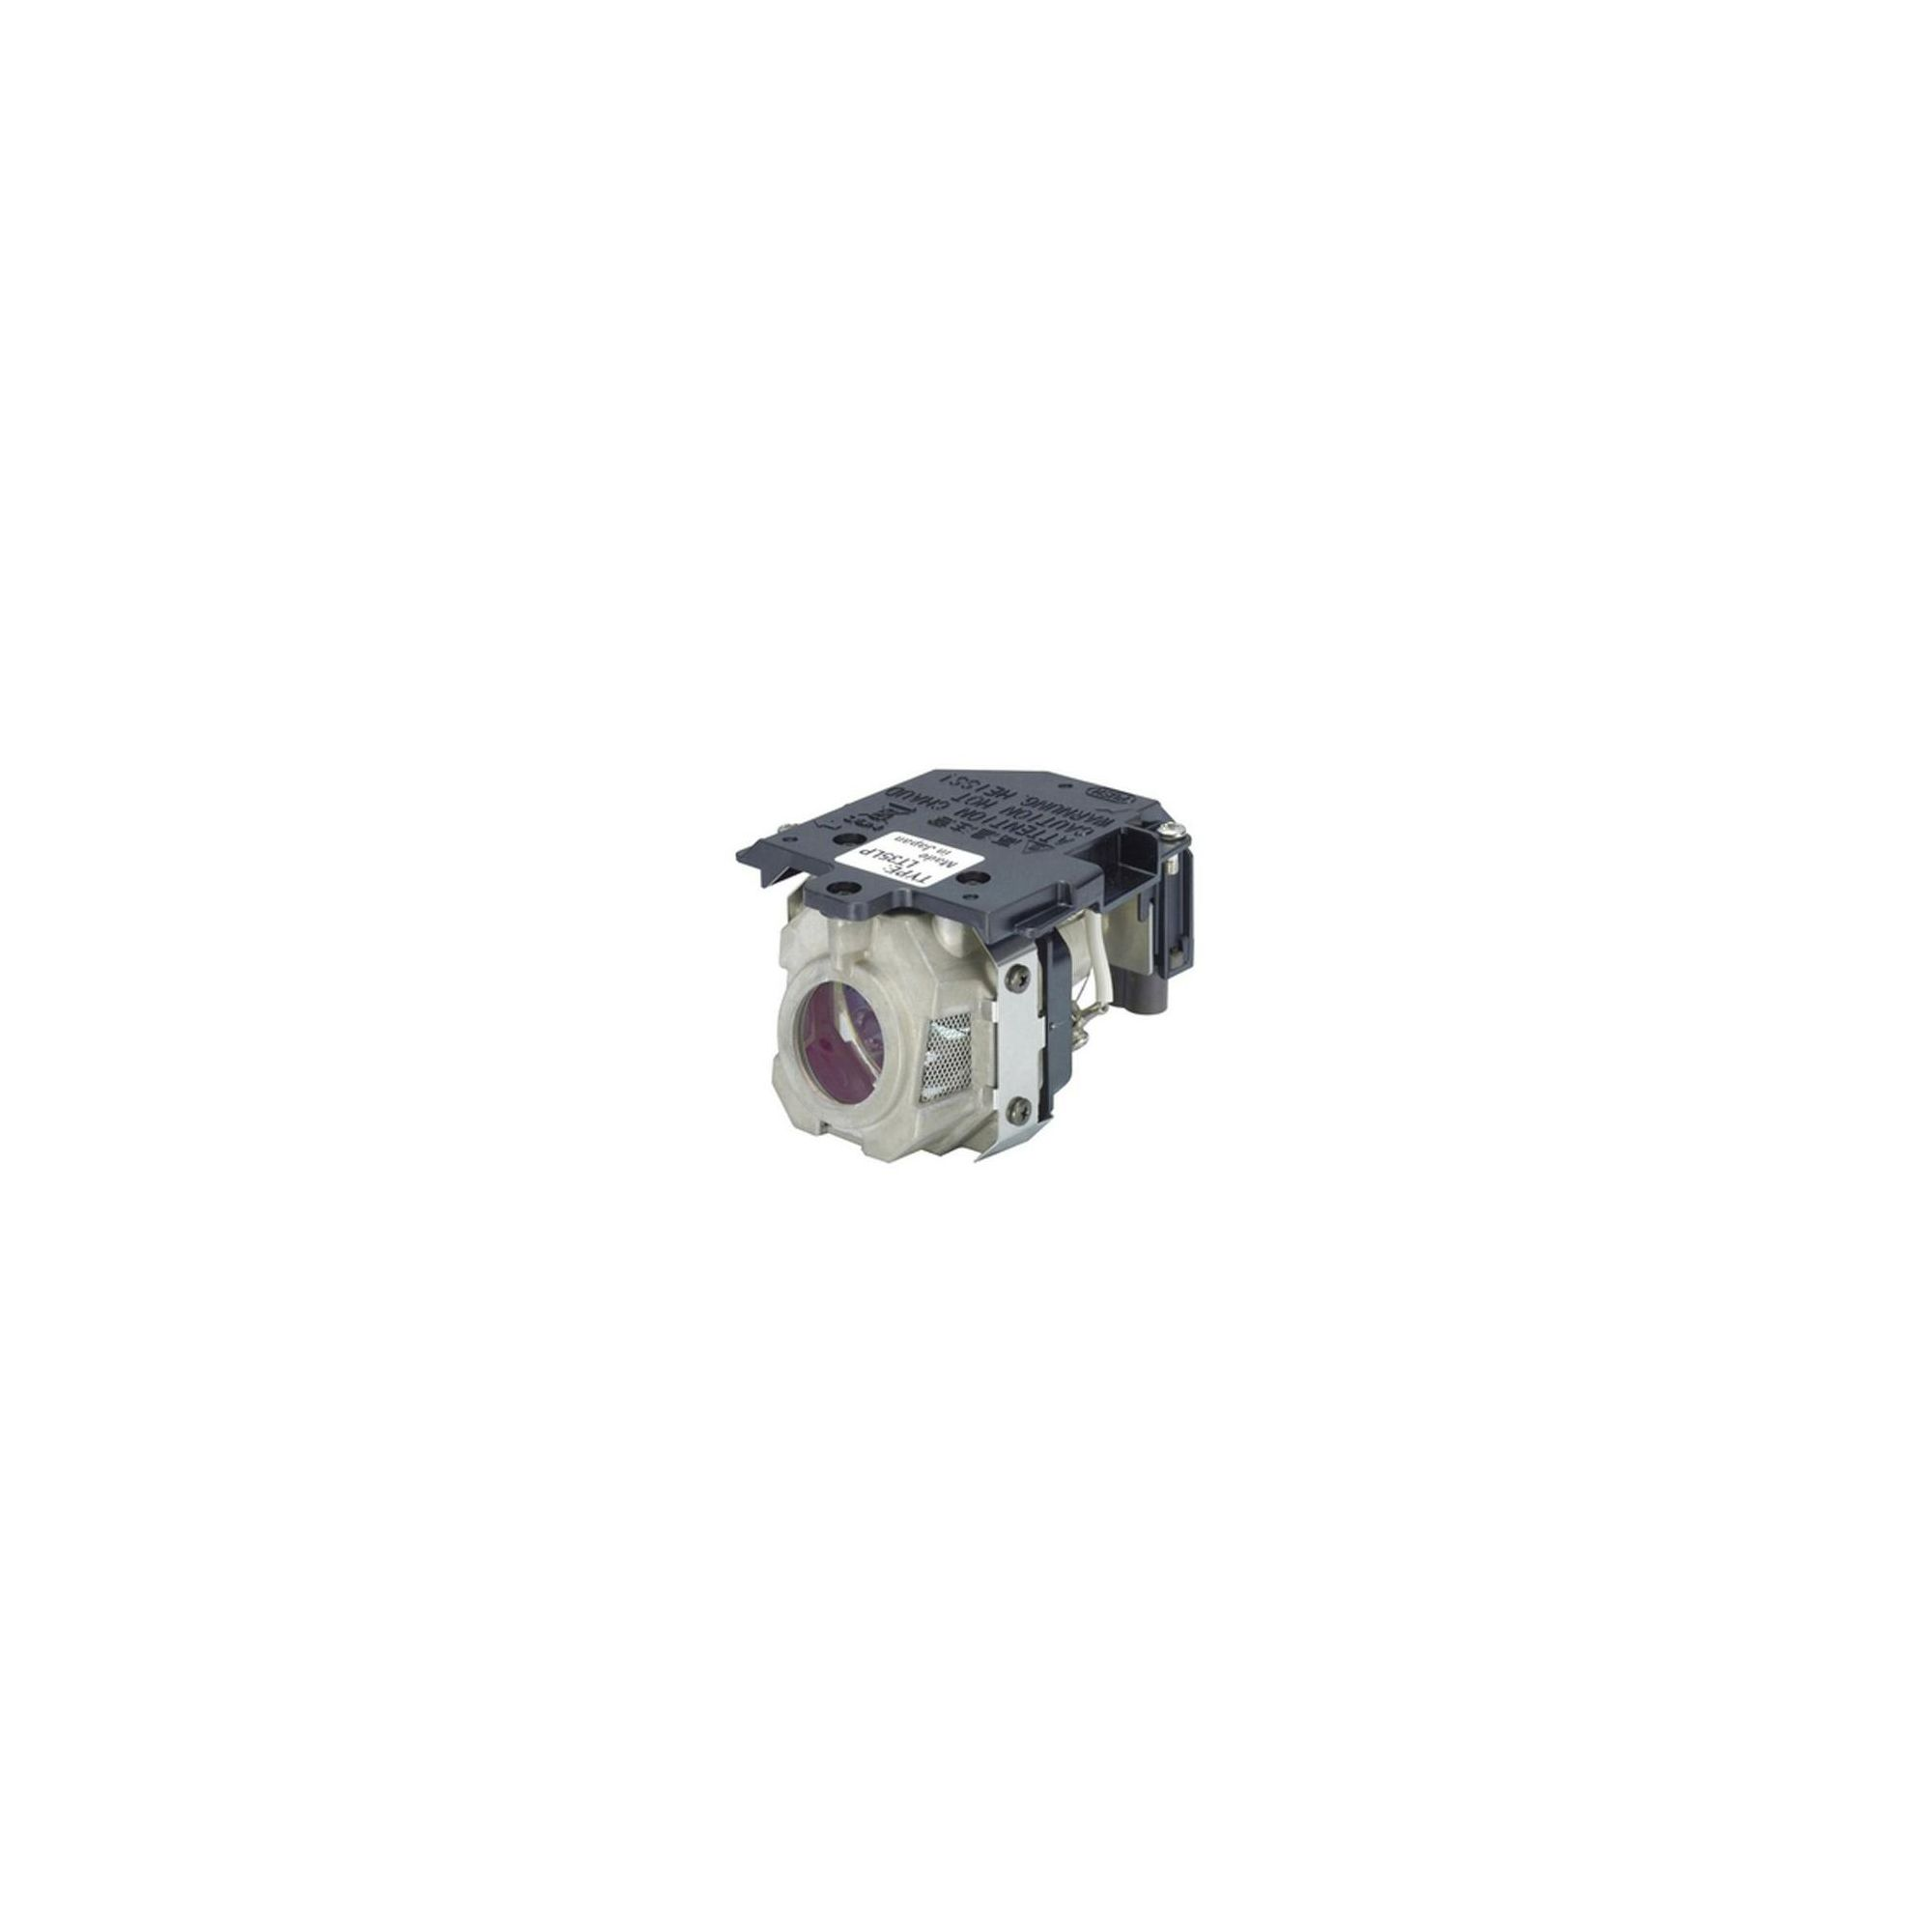 NEC Displays LT35LP Spare Lamp for LT35 at Tesco Direct